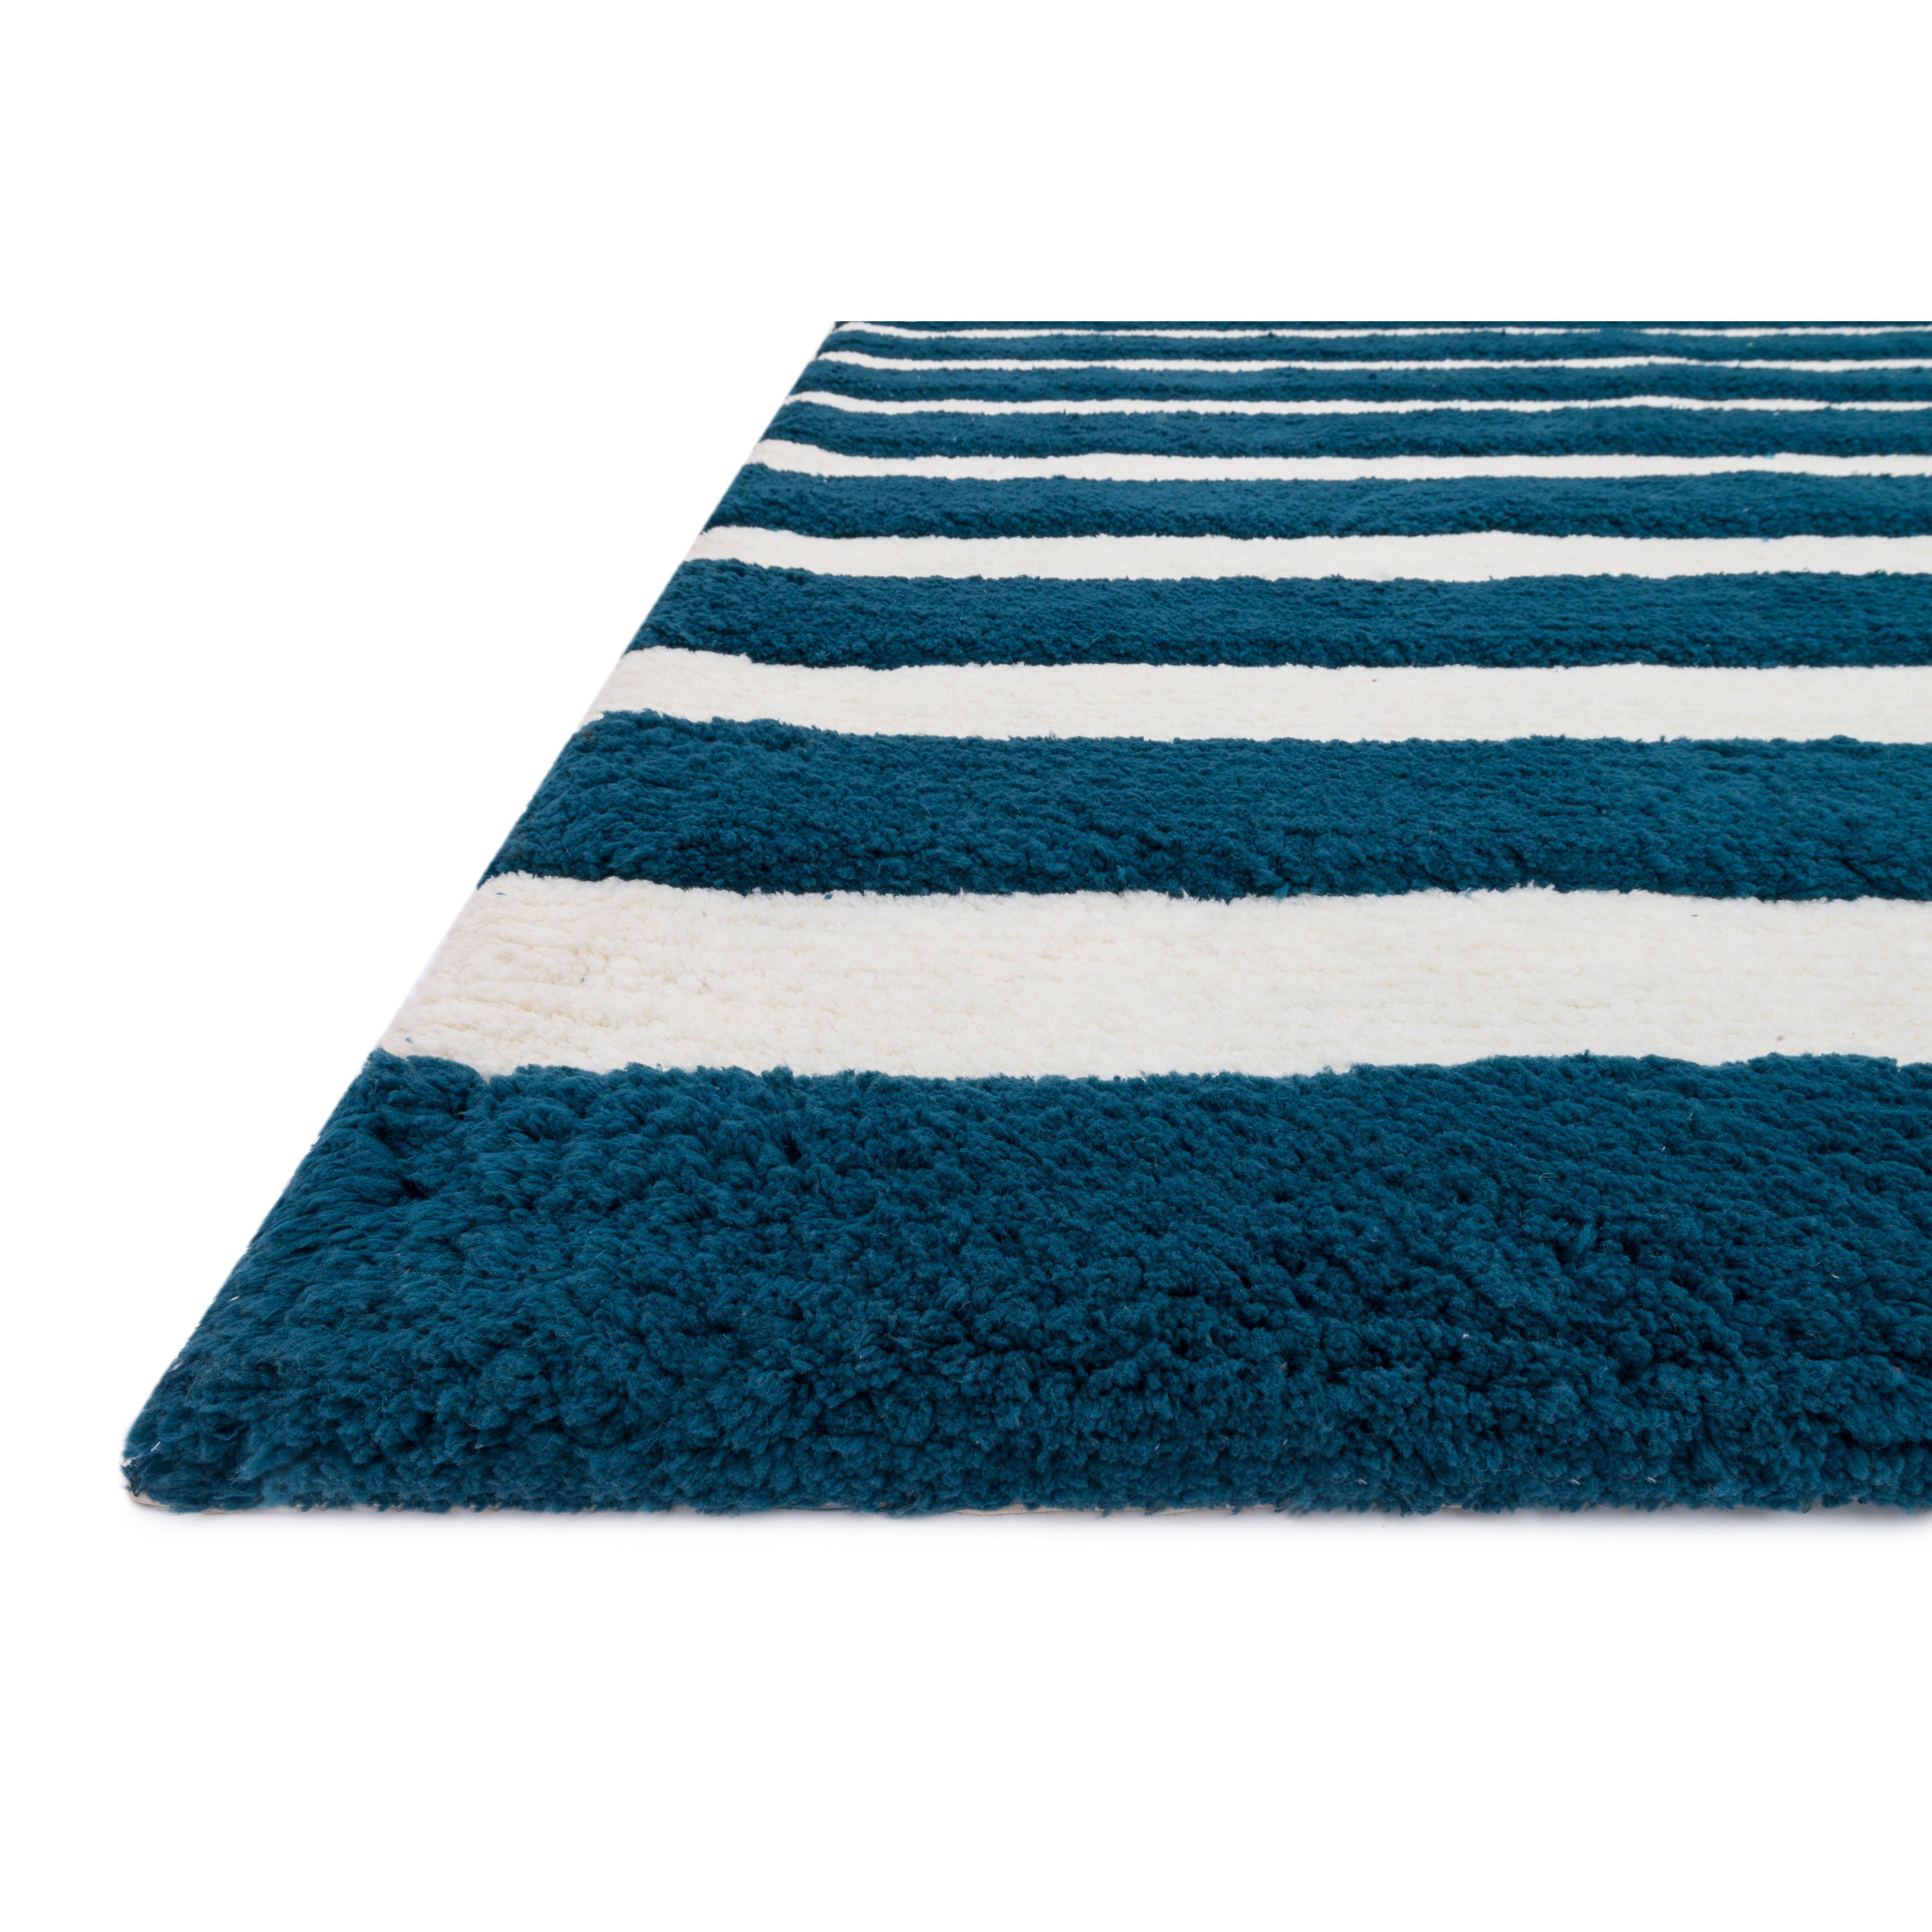 loloi rugs lola handmade navy white shag area rug reviews wayfair. Black Bedroom Furniture Sets. Home Design Ideas